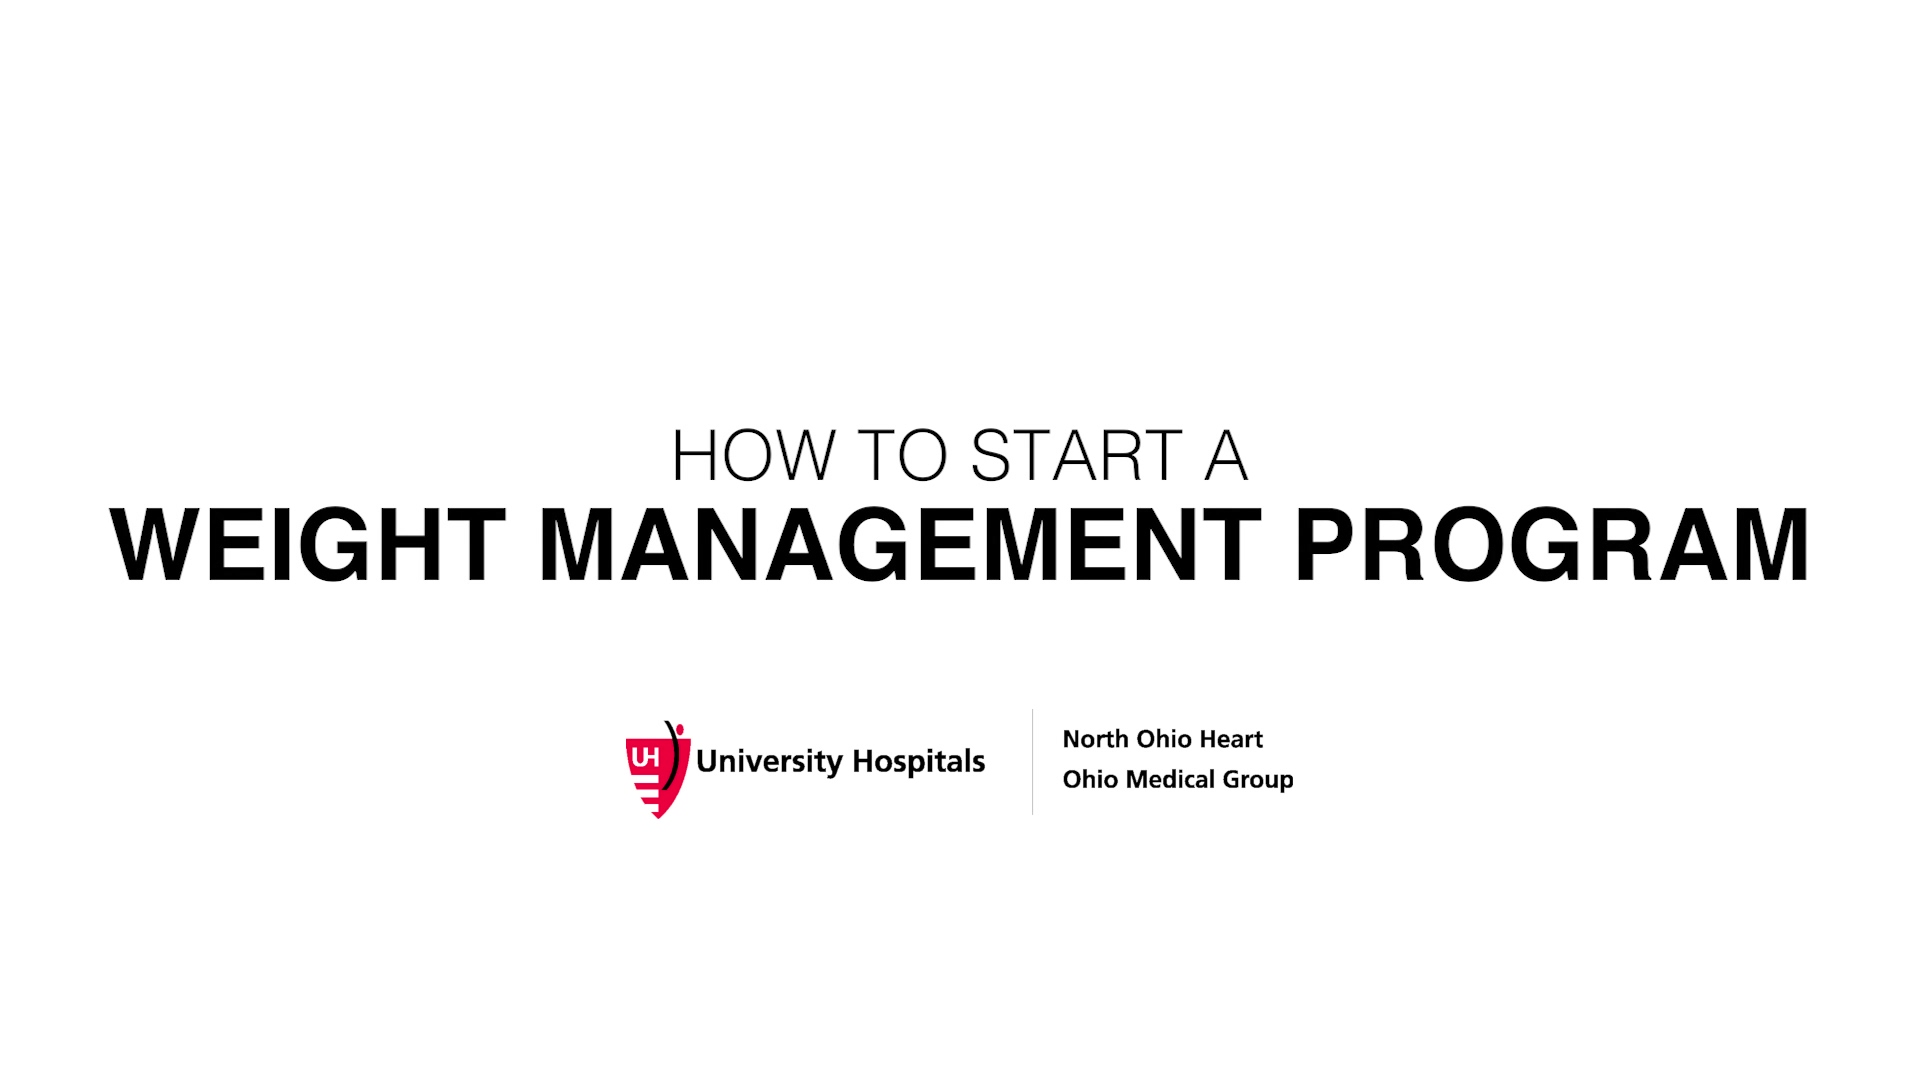 Dr Katsnelson-How To Start a Weight Management Program